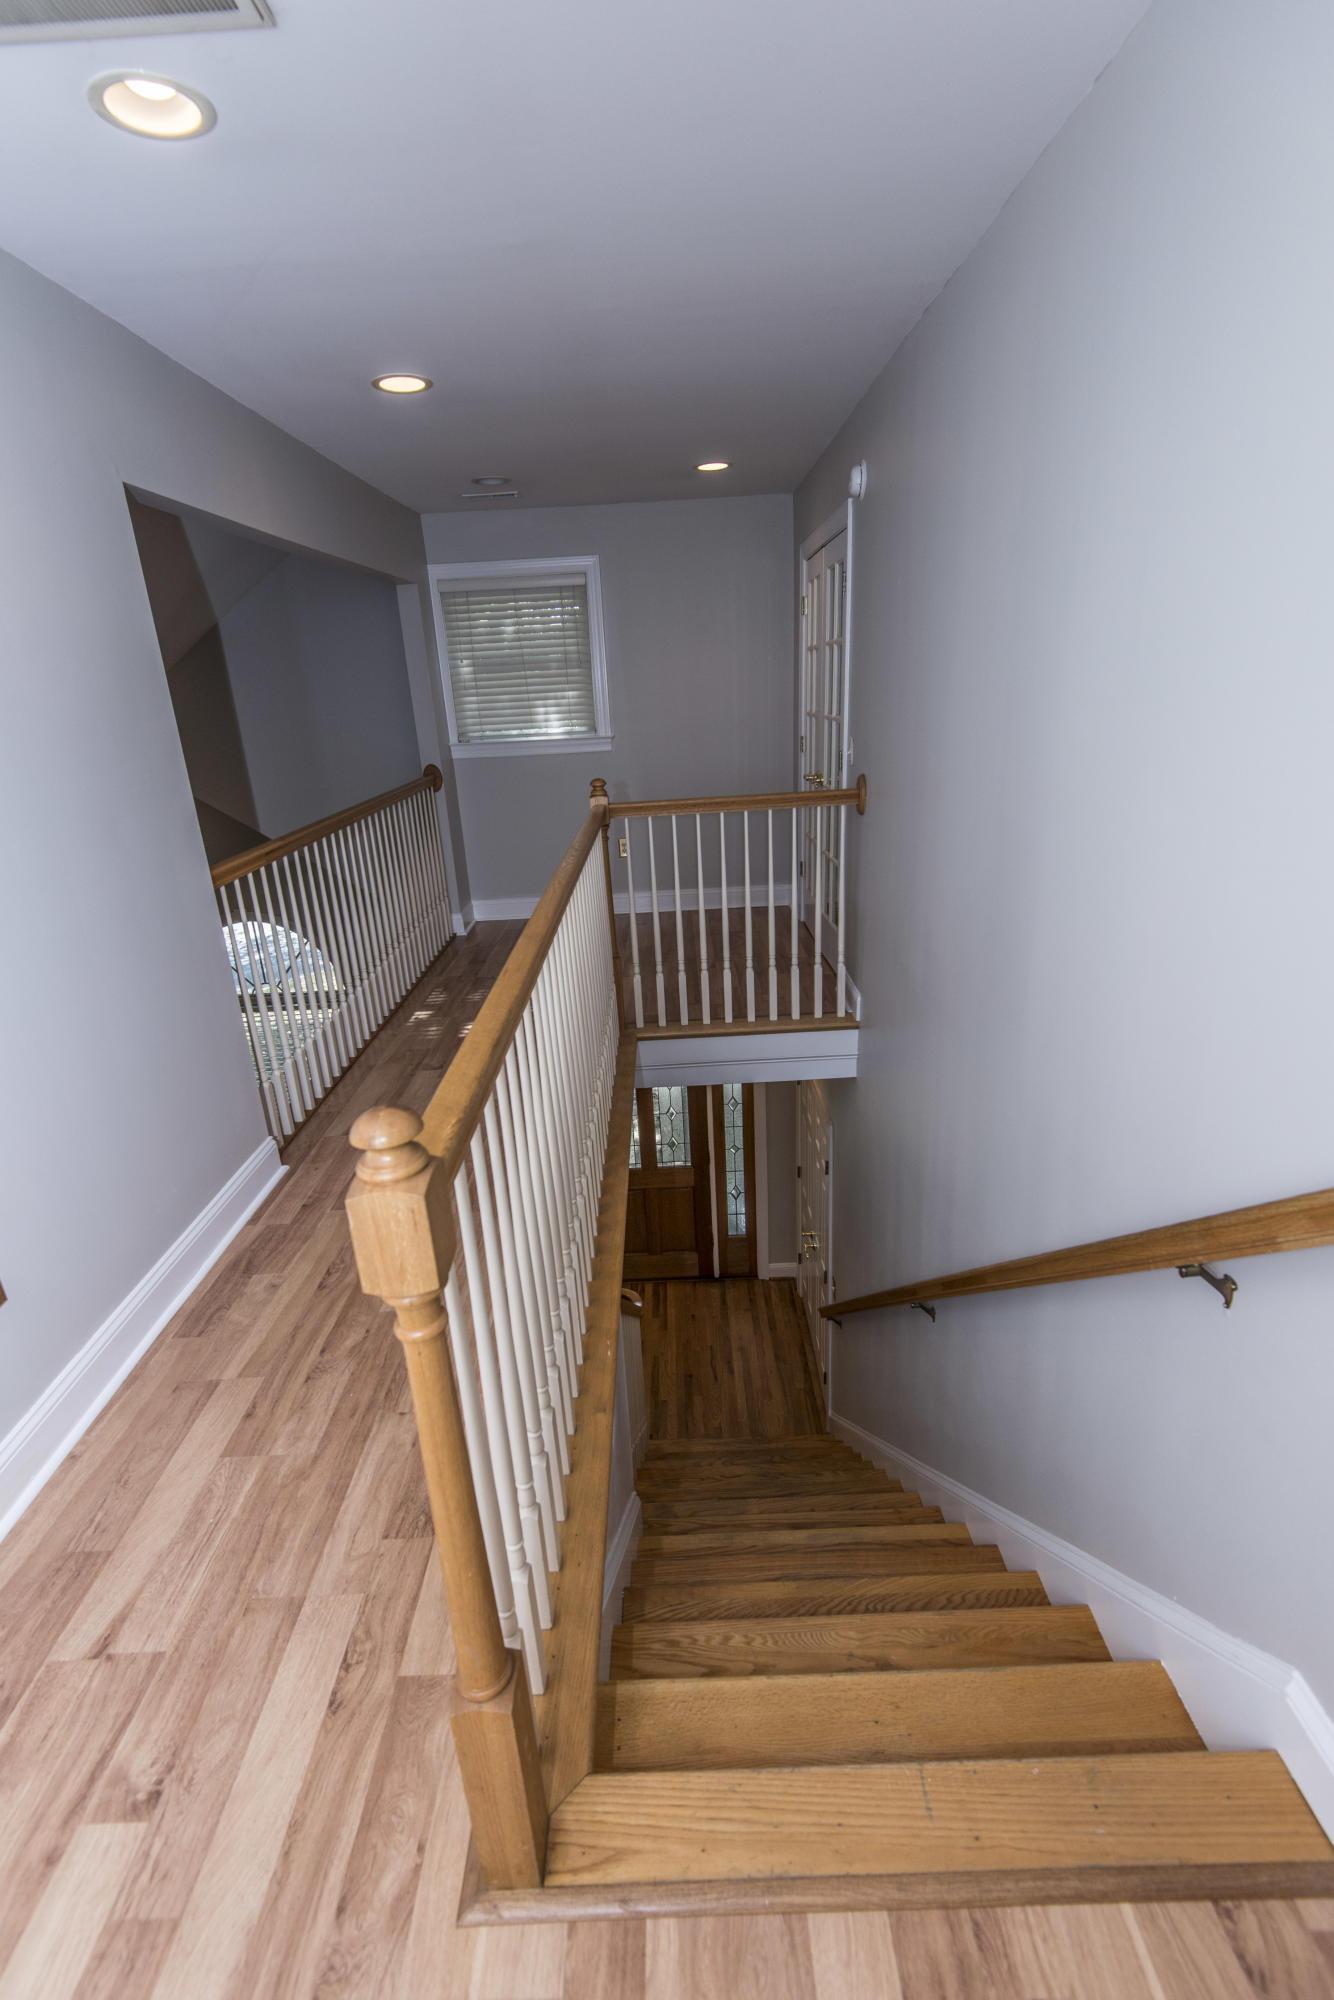 Laurel Lakes Homes For Sale - 1332 Woodlock, Mount Pleasant, SC - 23